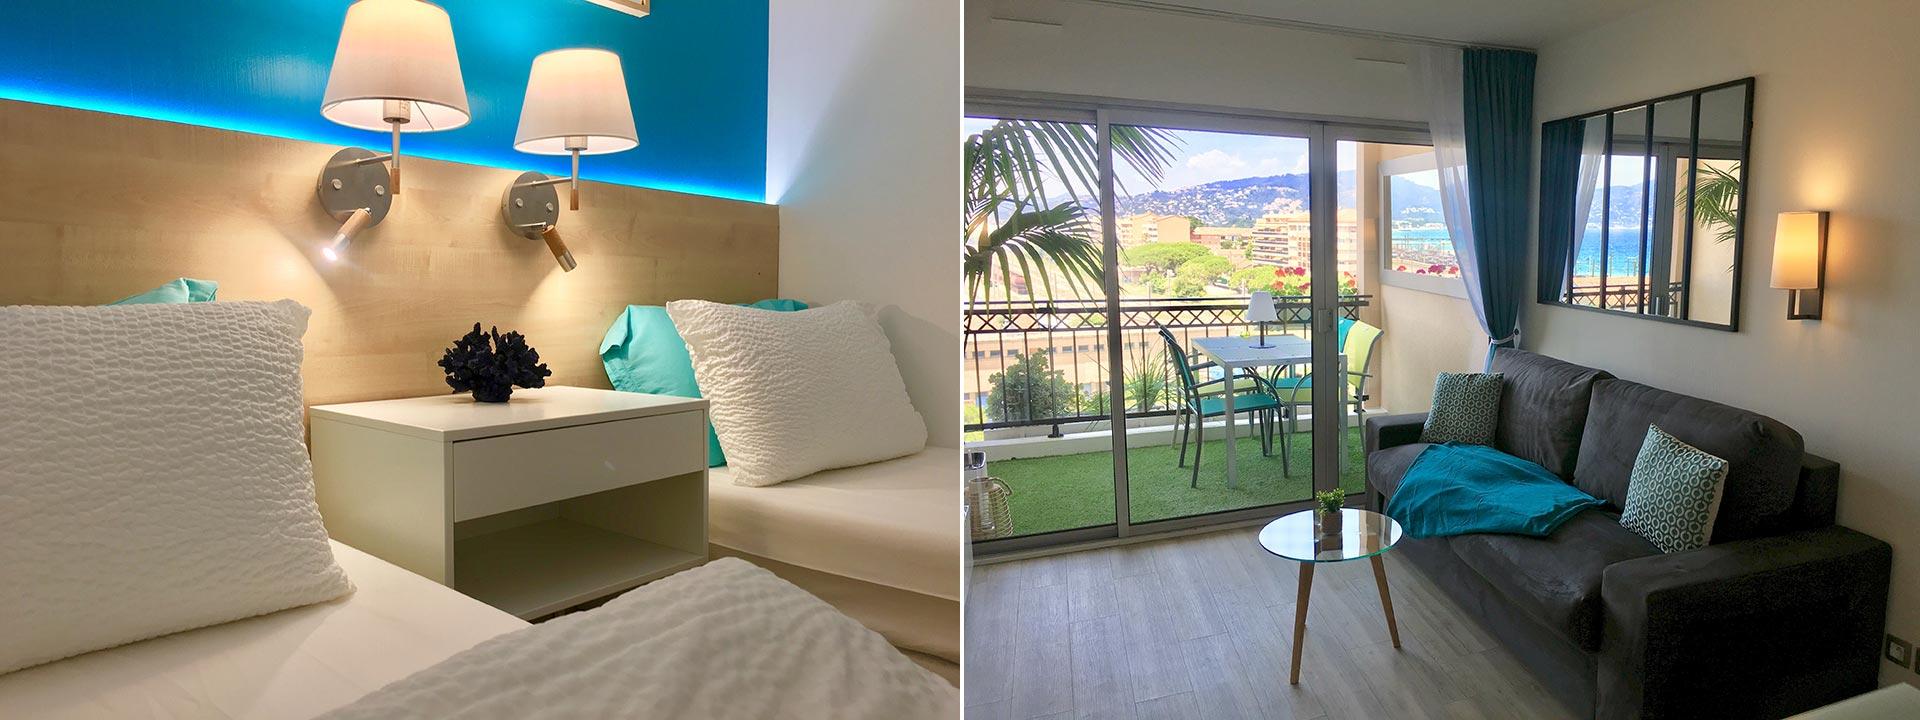 location-appartement-vacances-cannes-2